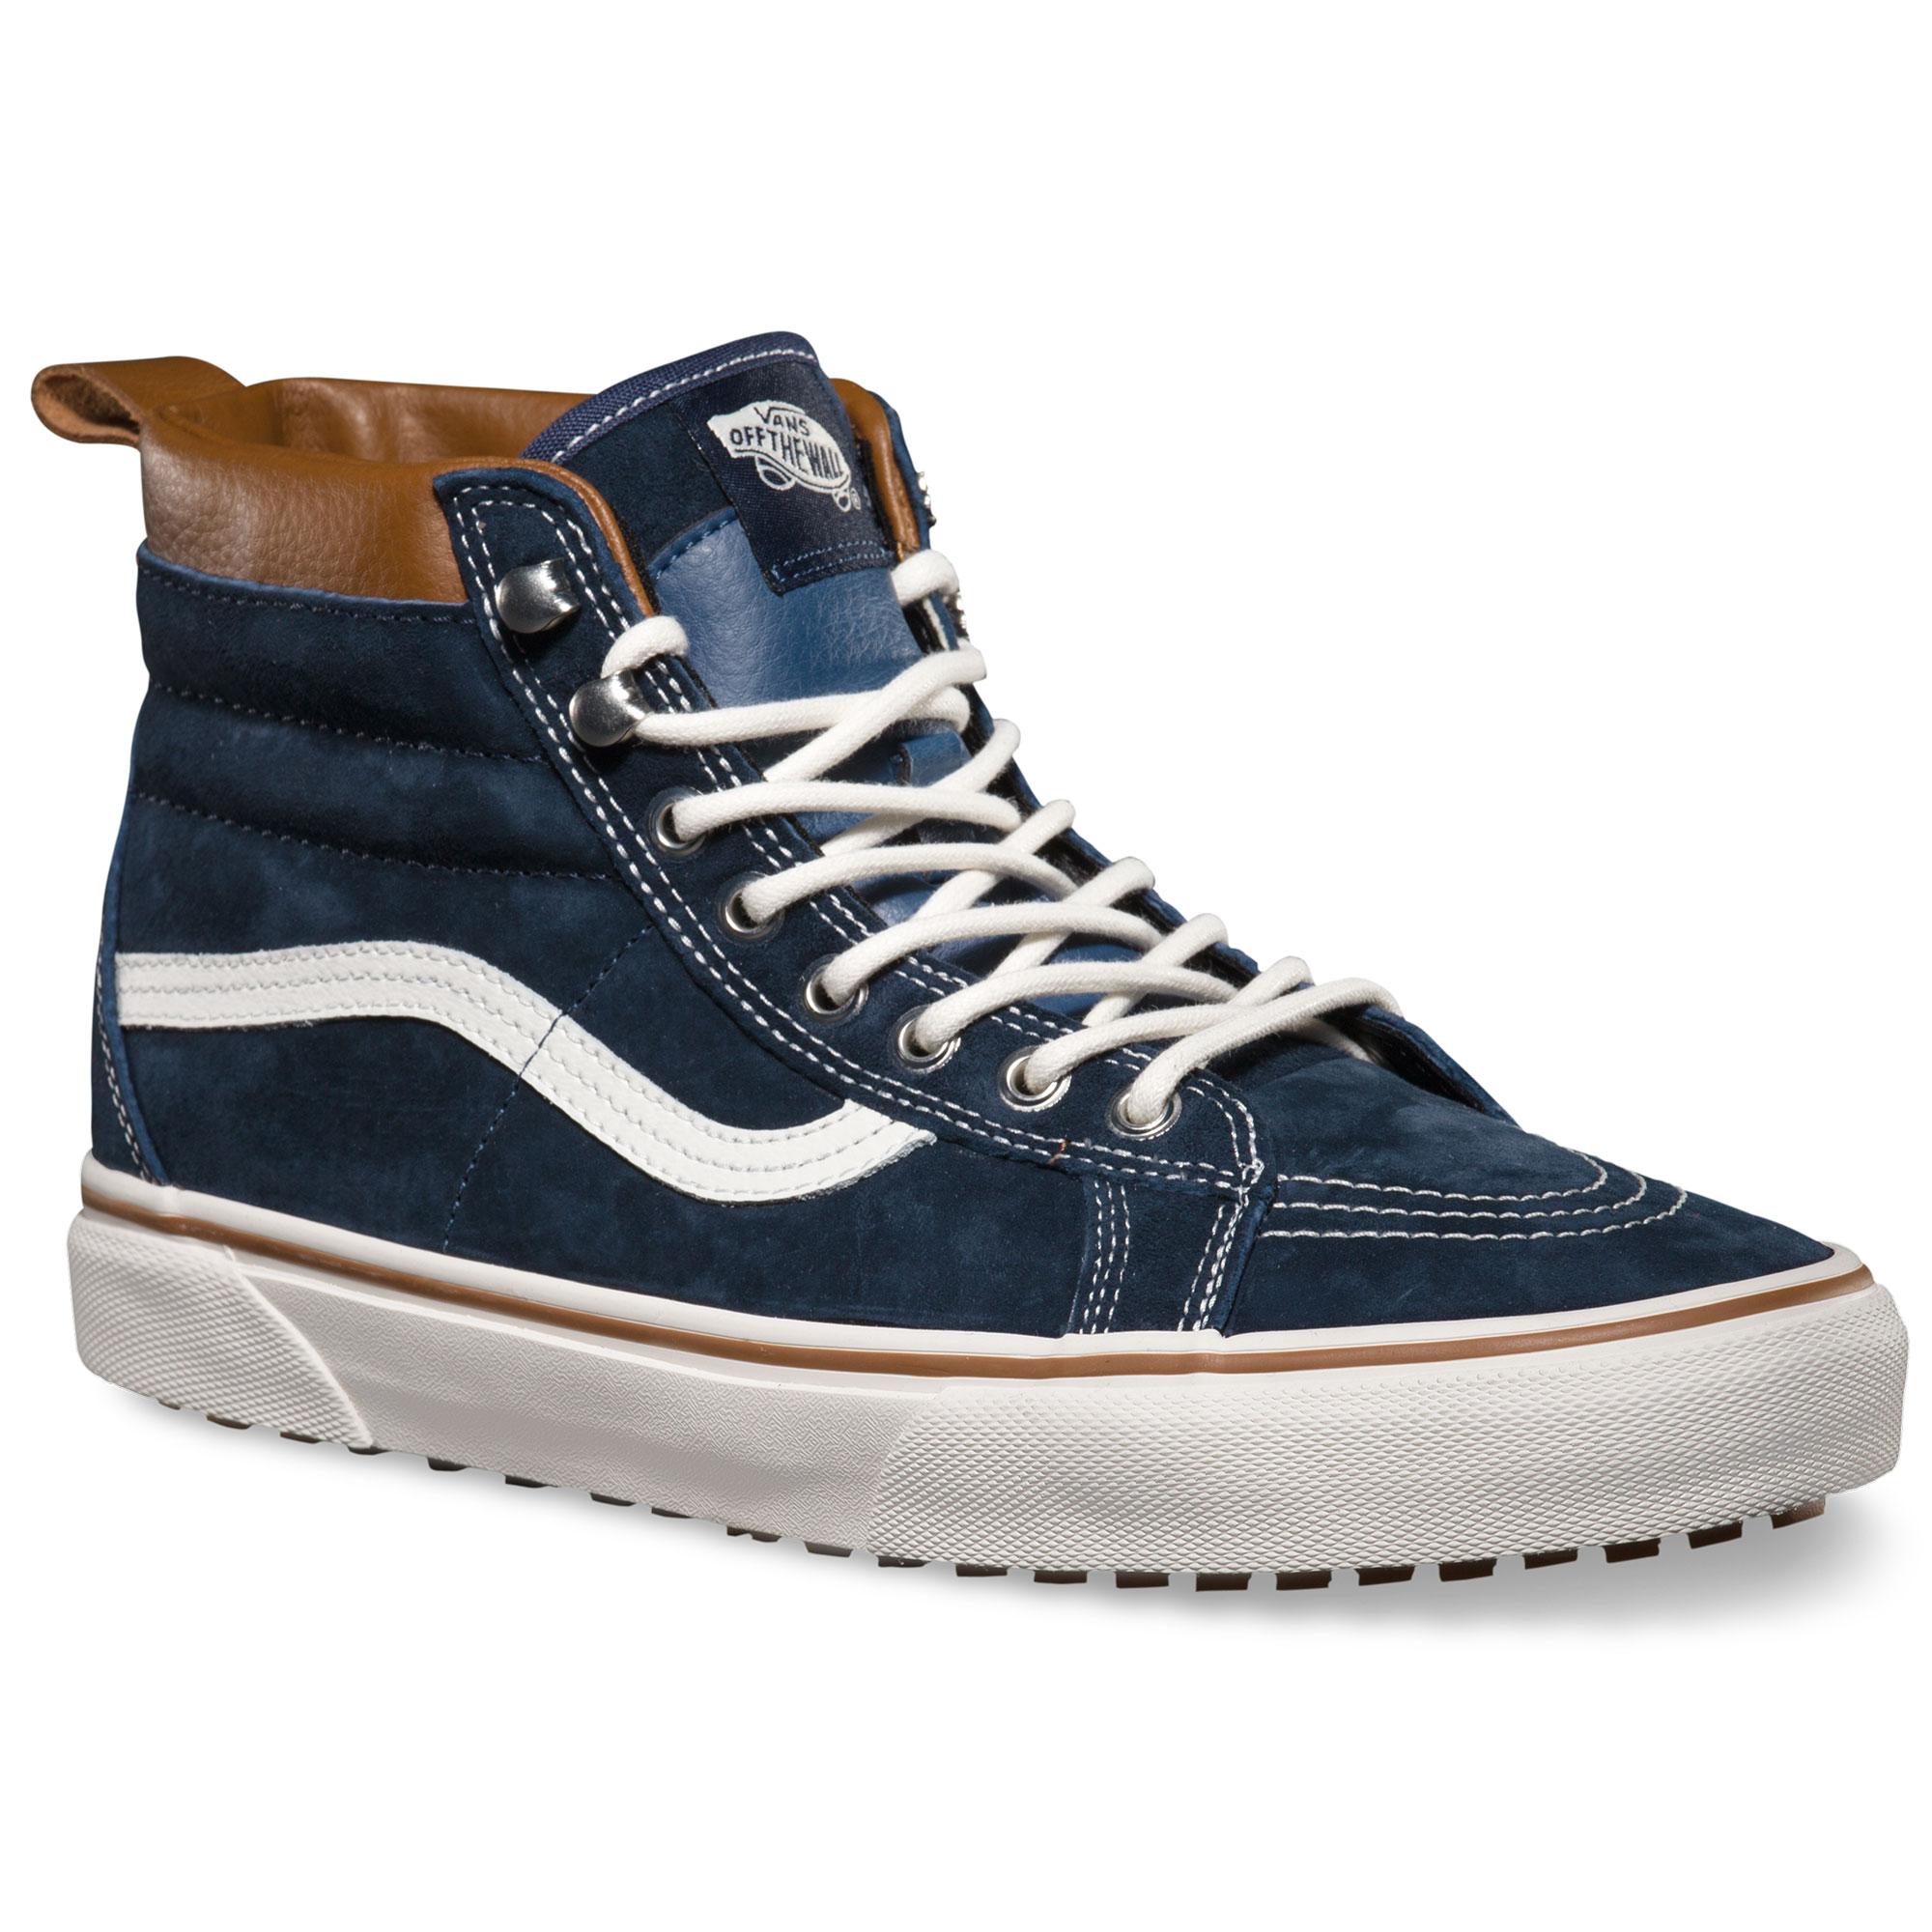 Vans Men s Sk8-Hi MTE Dress Blues Casual Shoes - Sun   Ski Sports 83c4593ce